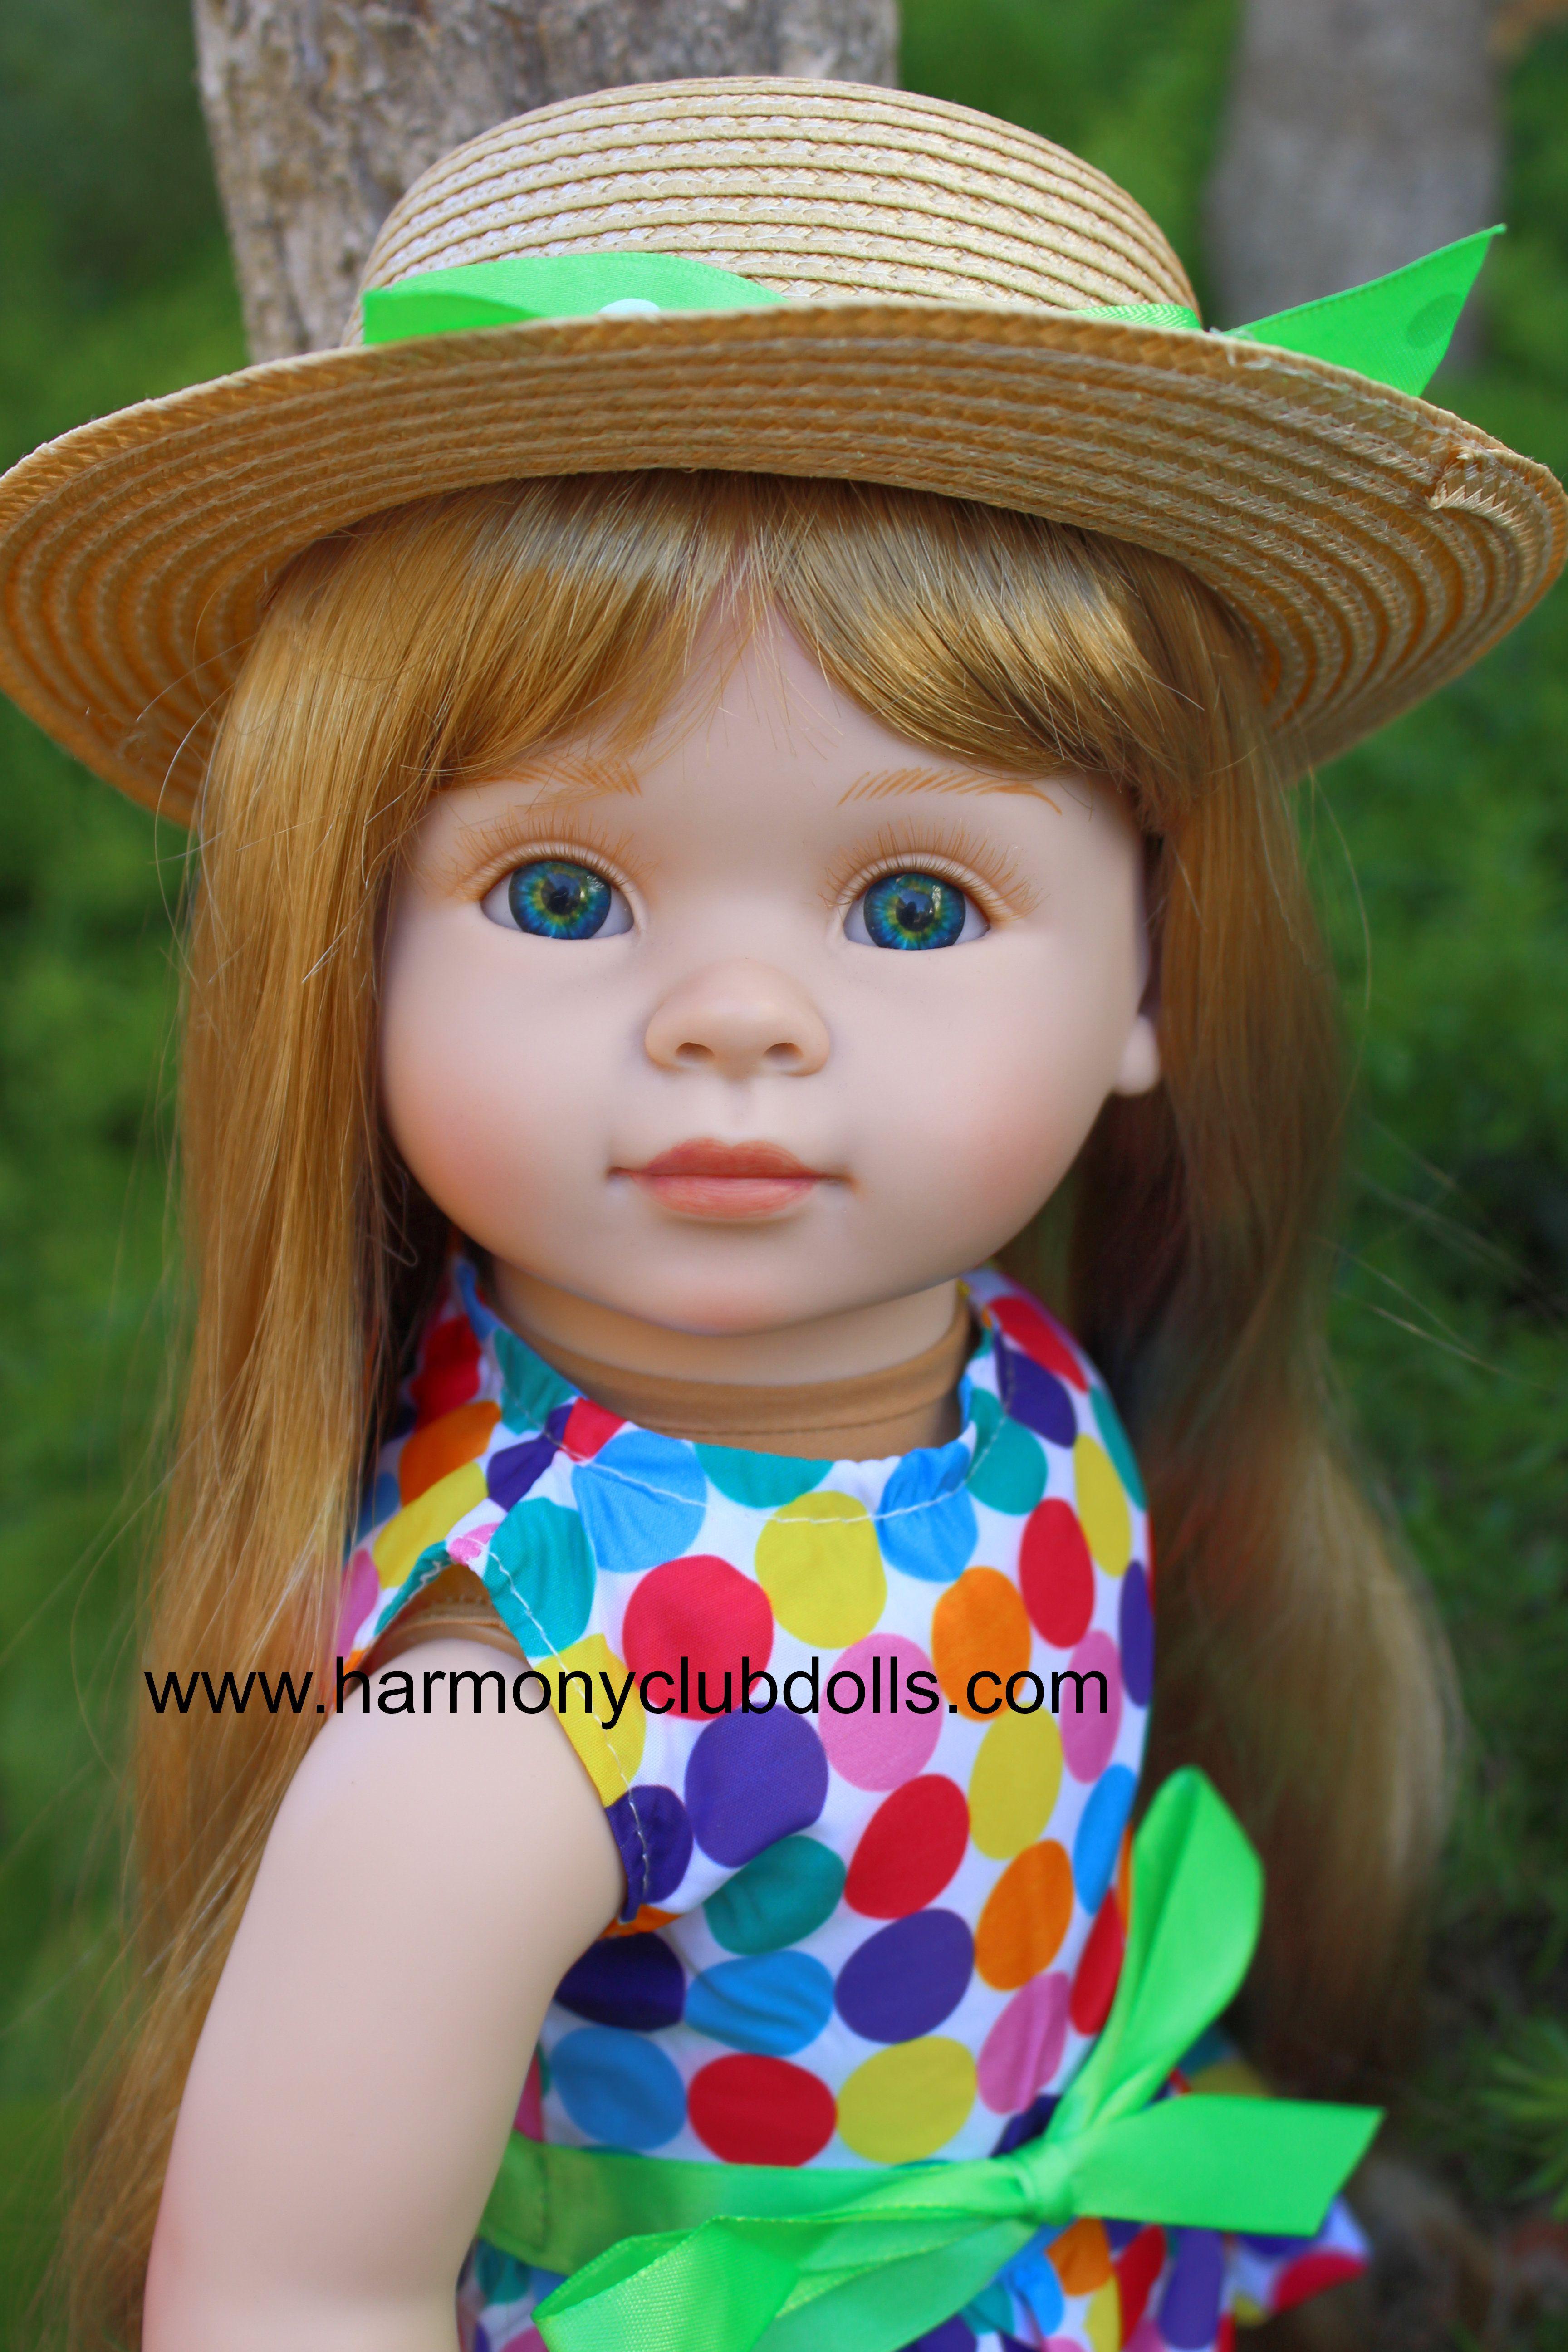 HARMONY CLUB DOLLS Over 300 styles to fit American Girl www.harmonyclubdolls.com